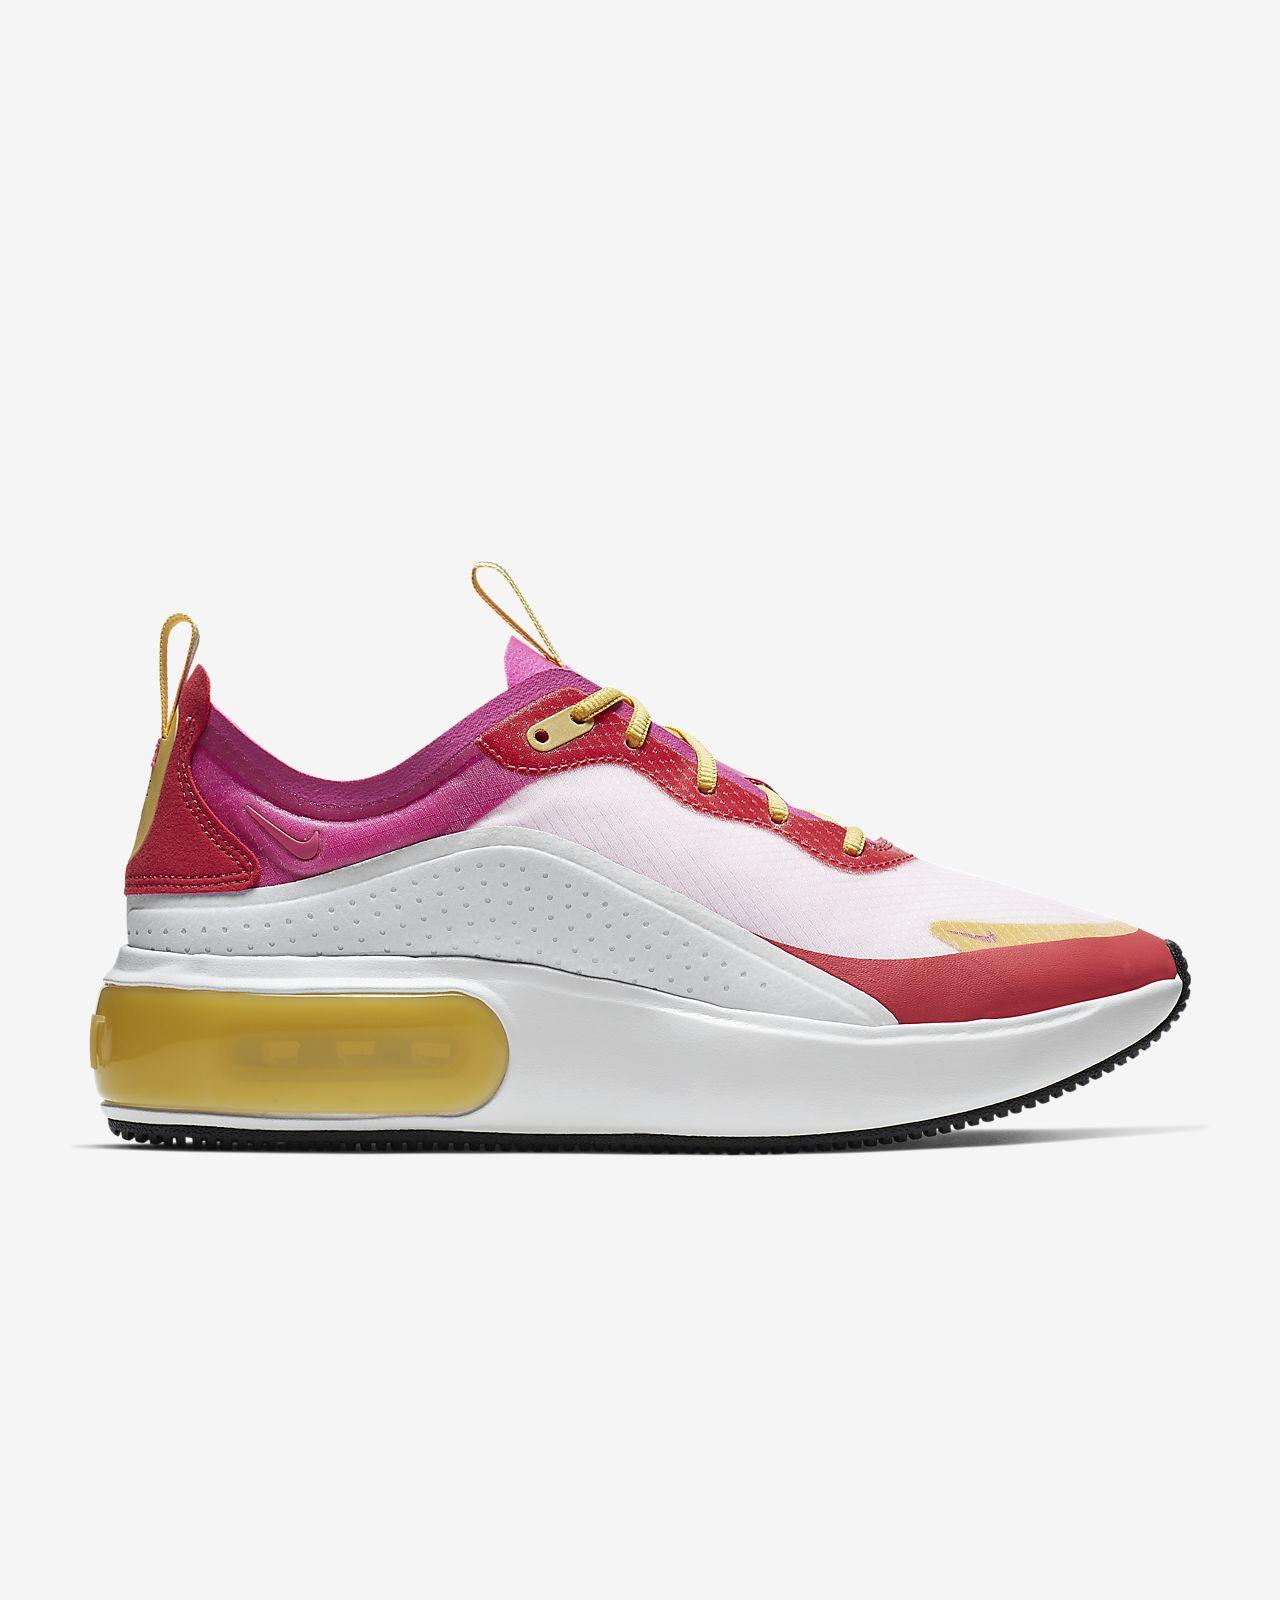 Nike Air Max Dia chaussures rose violet